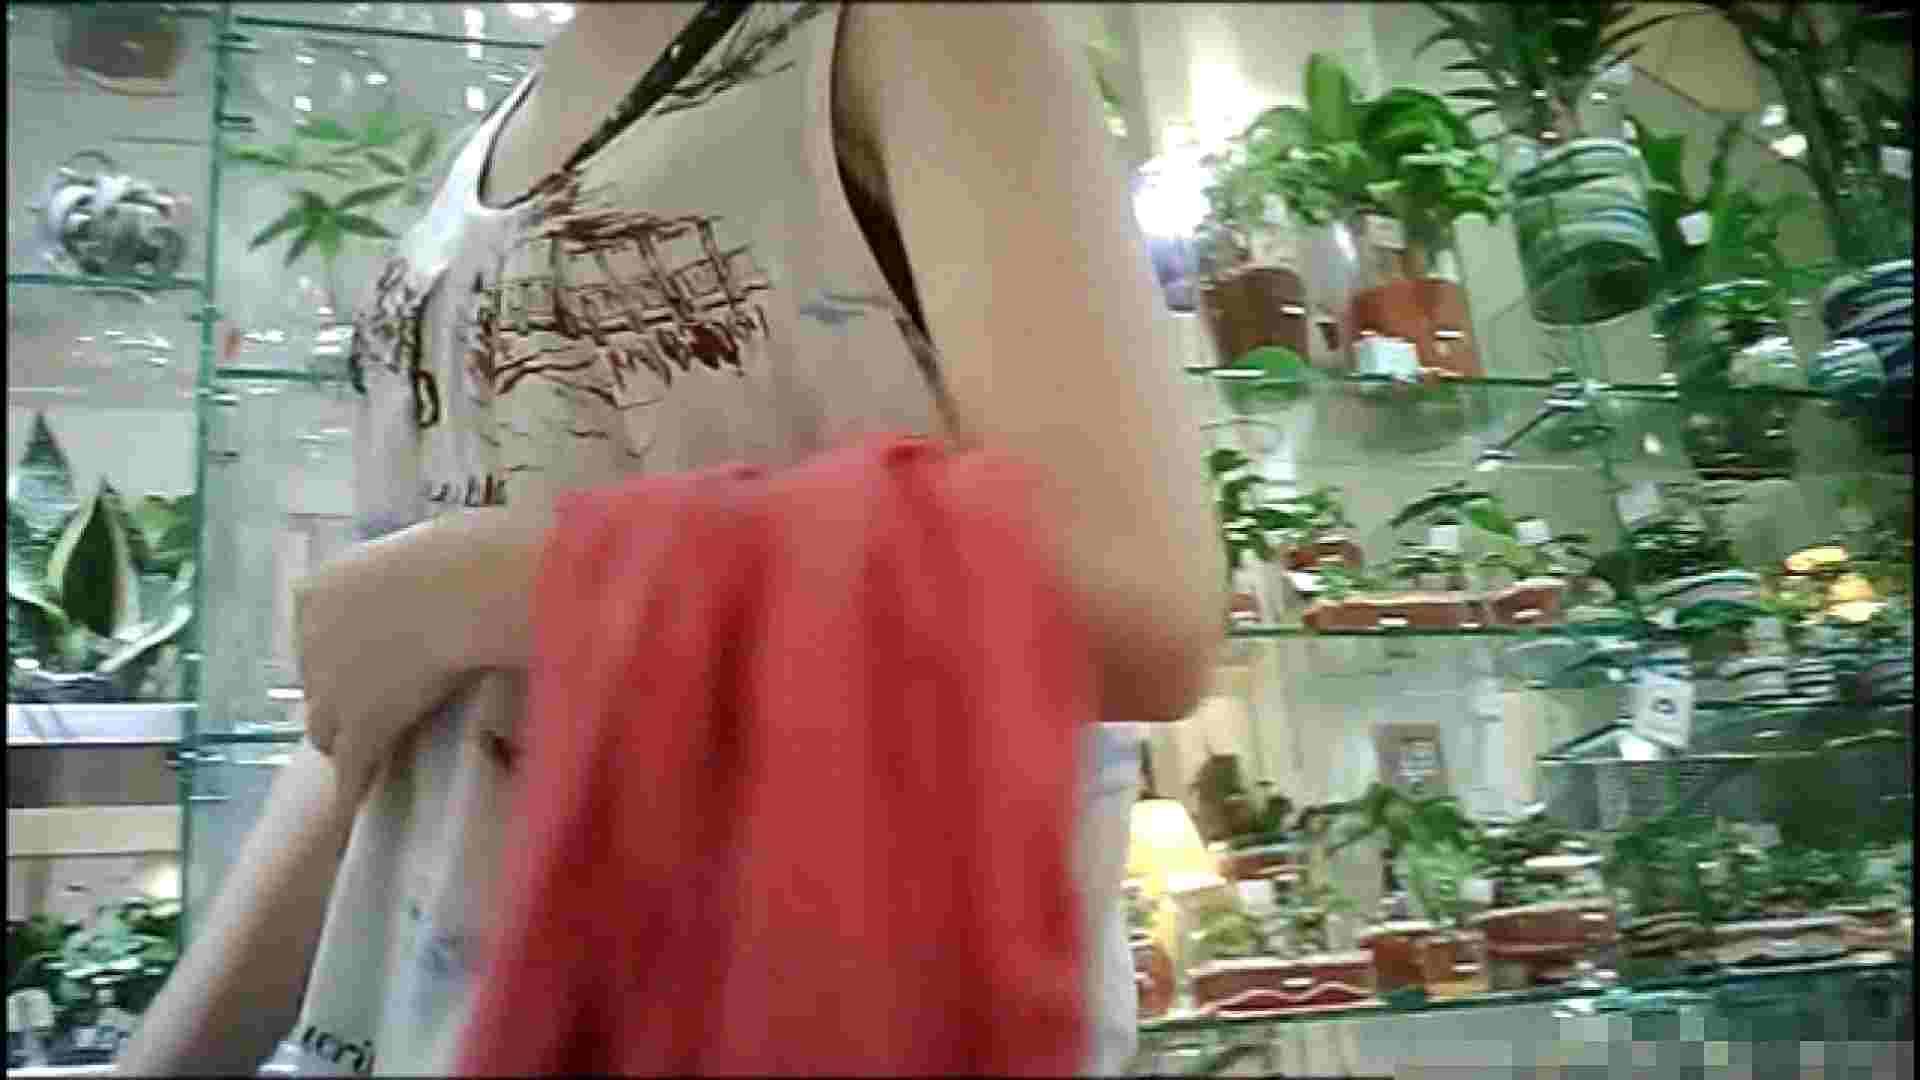 NO.1 普段から胸元がゆるい友達【某ファッションビル内の雑貨屋】 友人 | 胸チラ  68連発 23